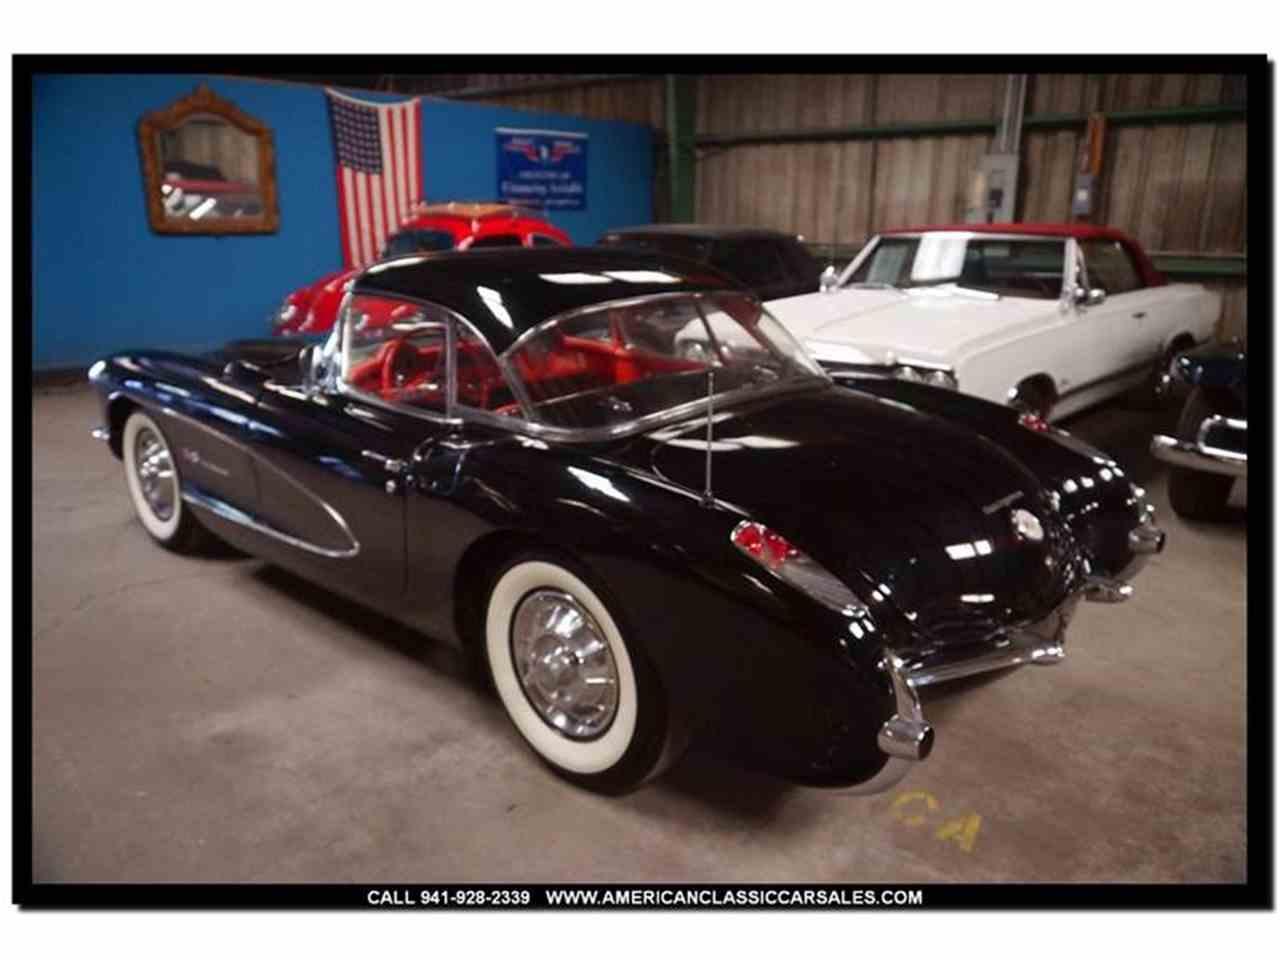 1957 chevrolet corvette for sale on classiccars com 31 - Photo 8